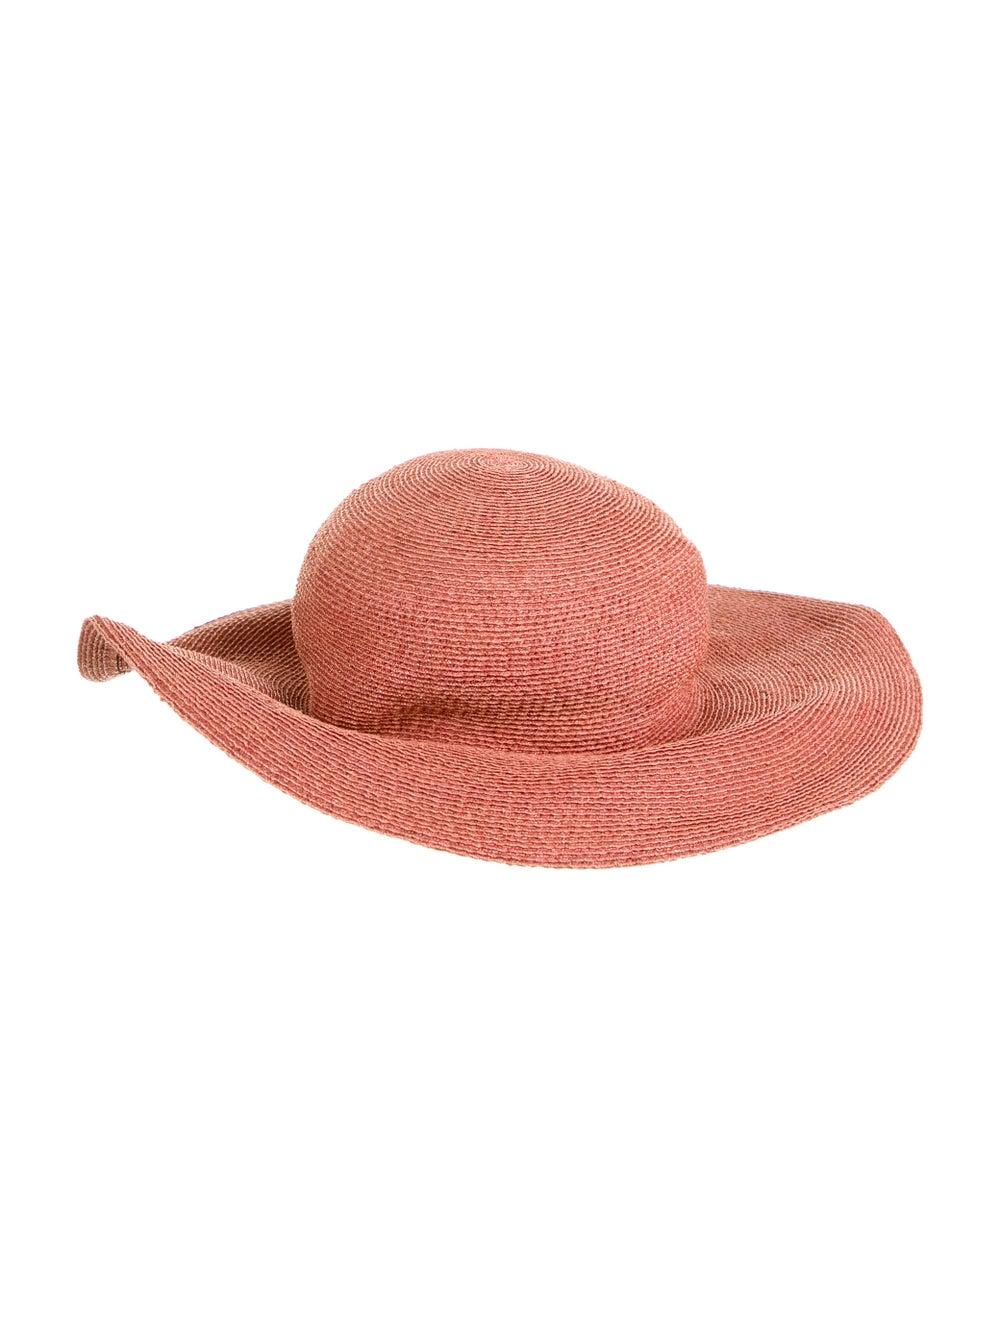 Patricia Underwood Raffia Wide-Brim Hat red - image 1